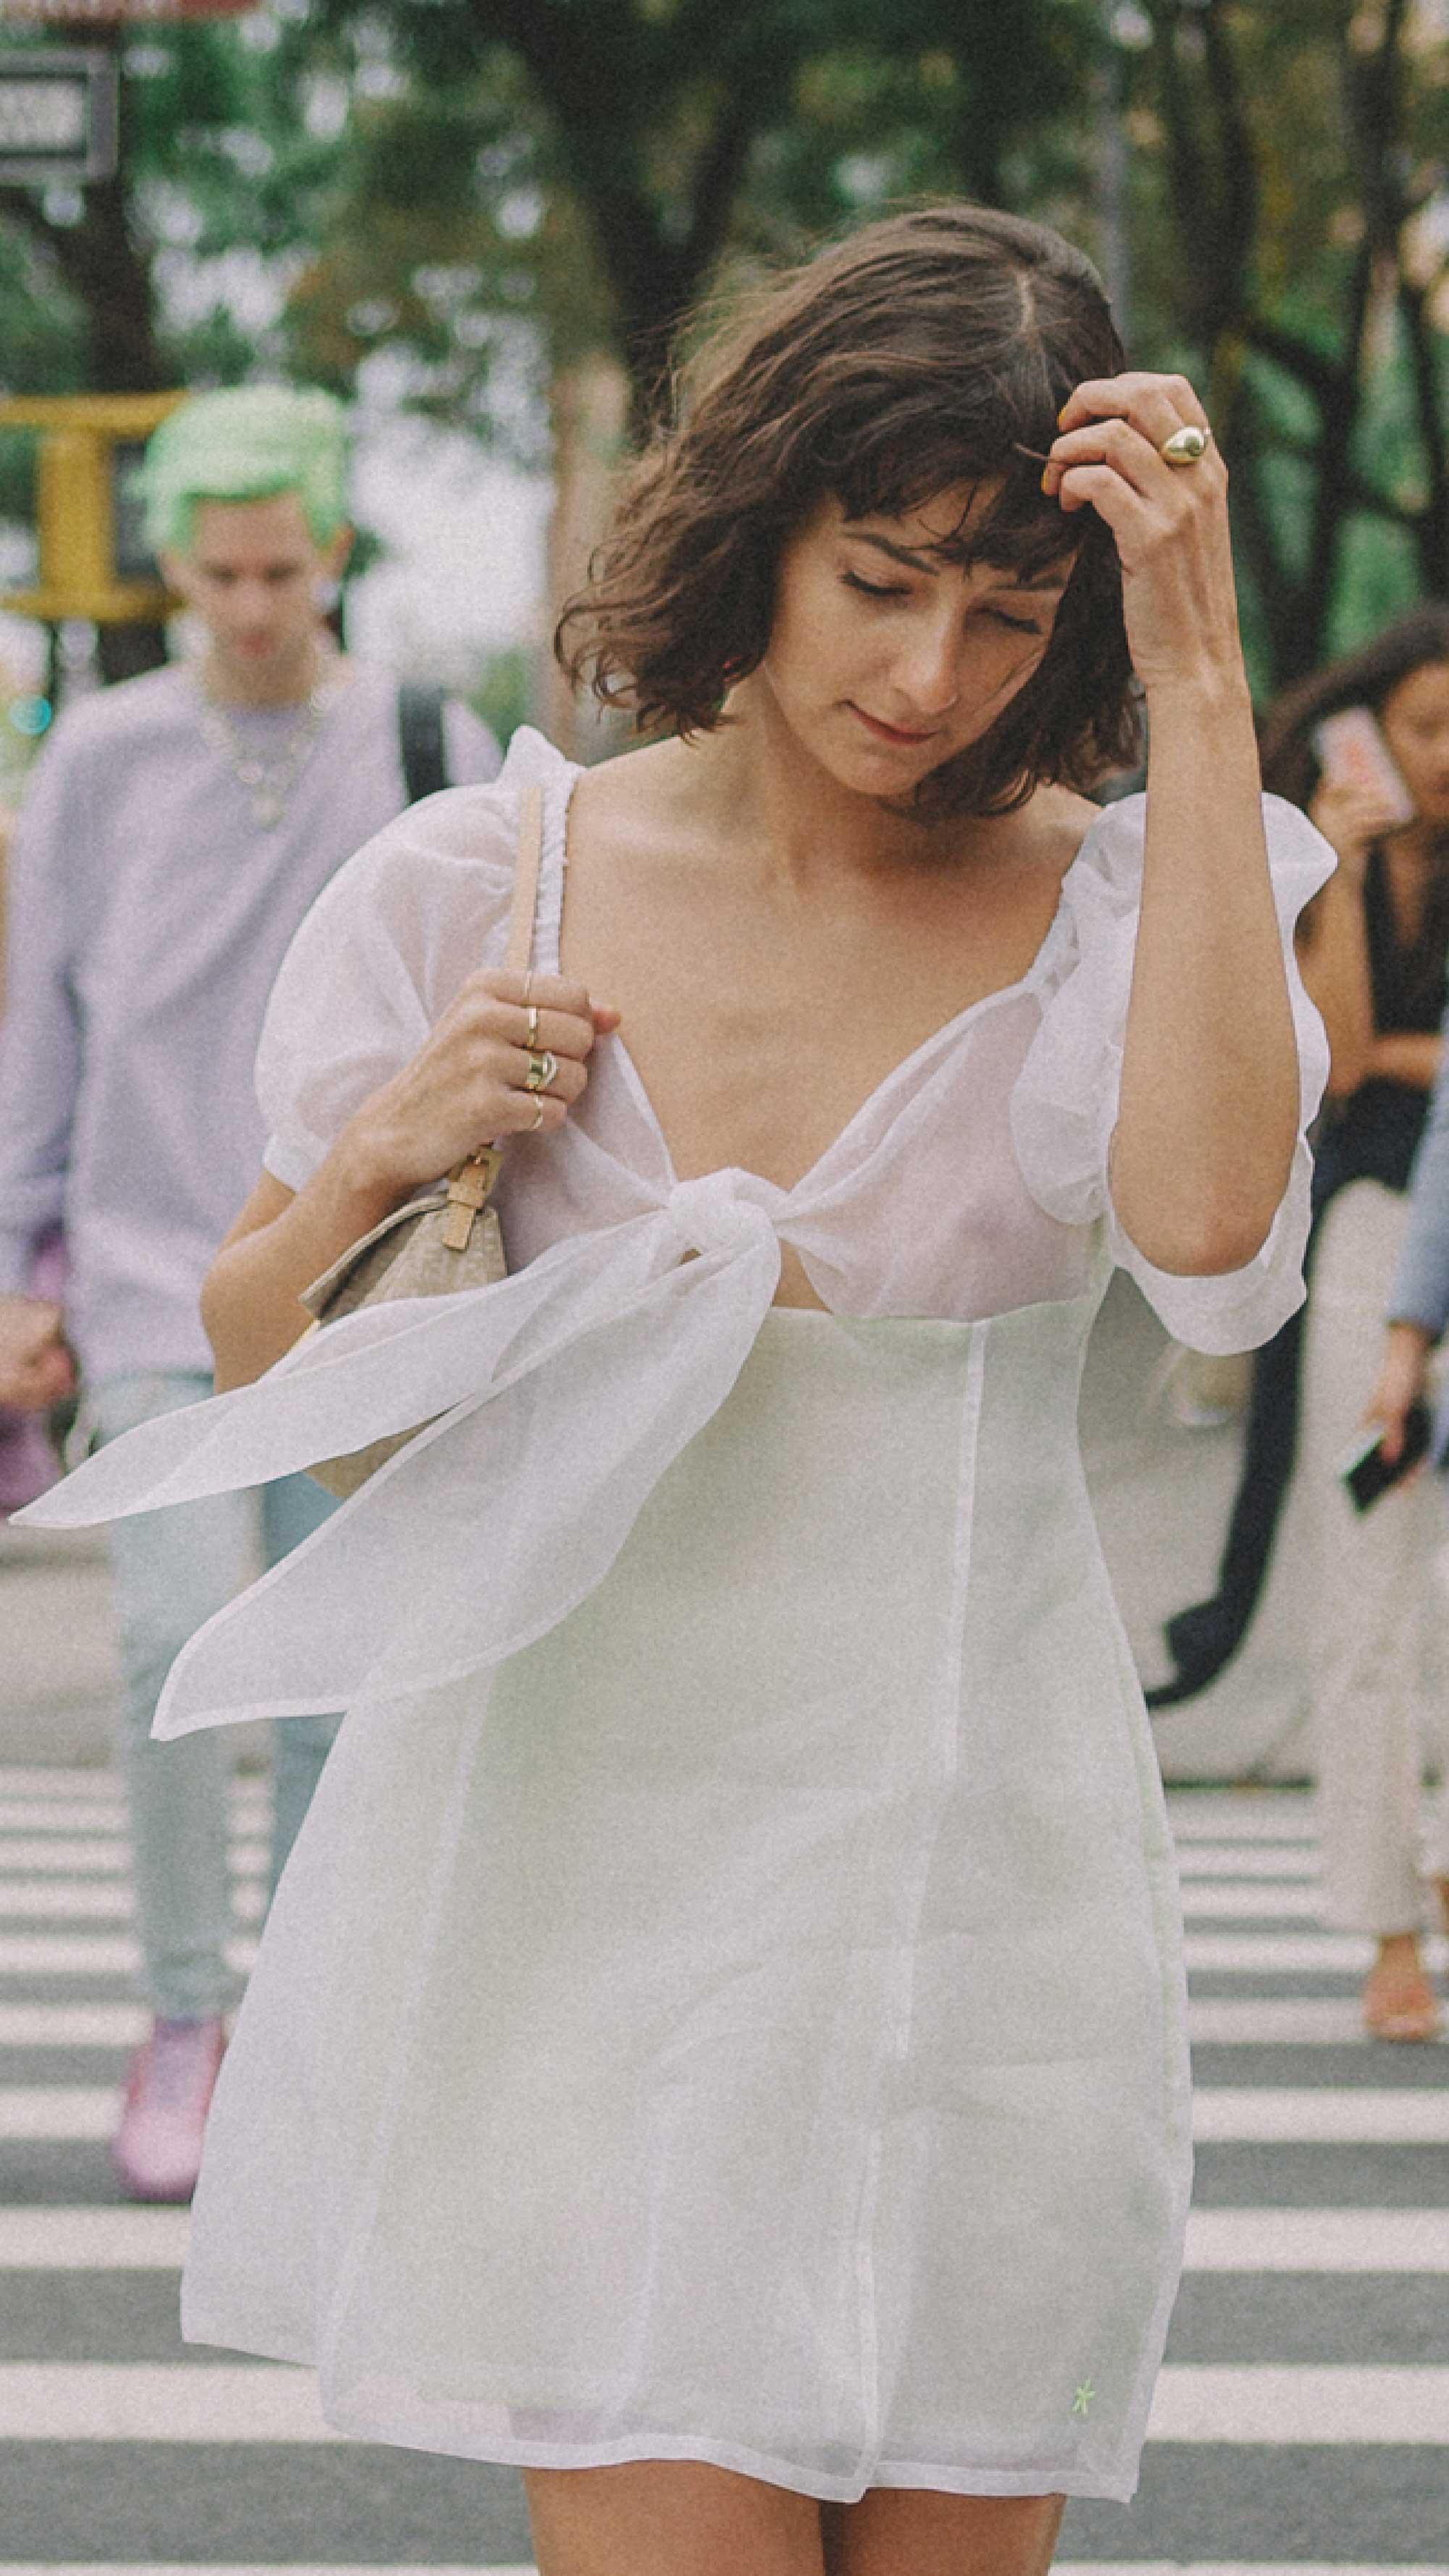 New-York-Fashion-Week-NYFW-SS18-street-style-day-three-SS1811.jpg